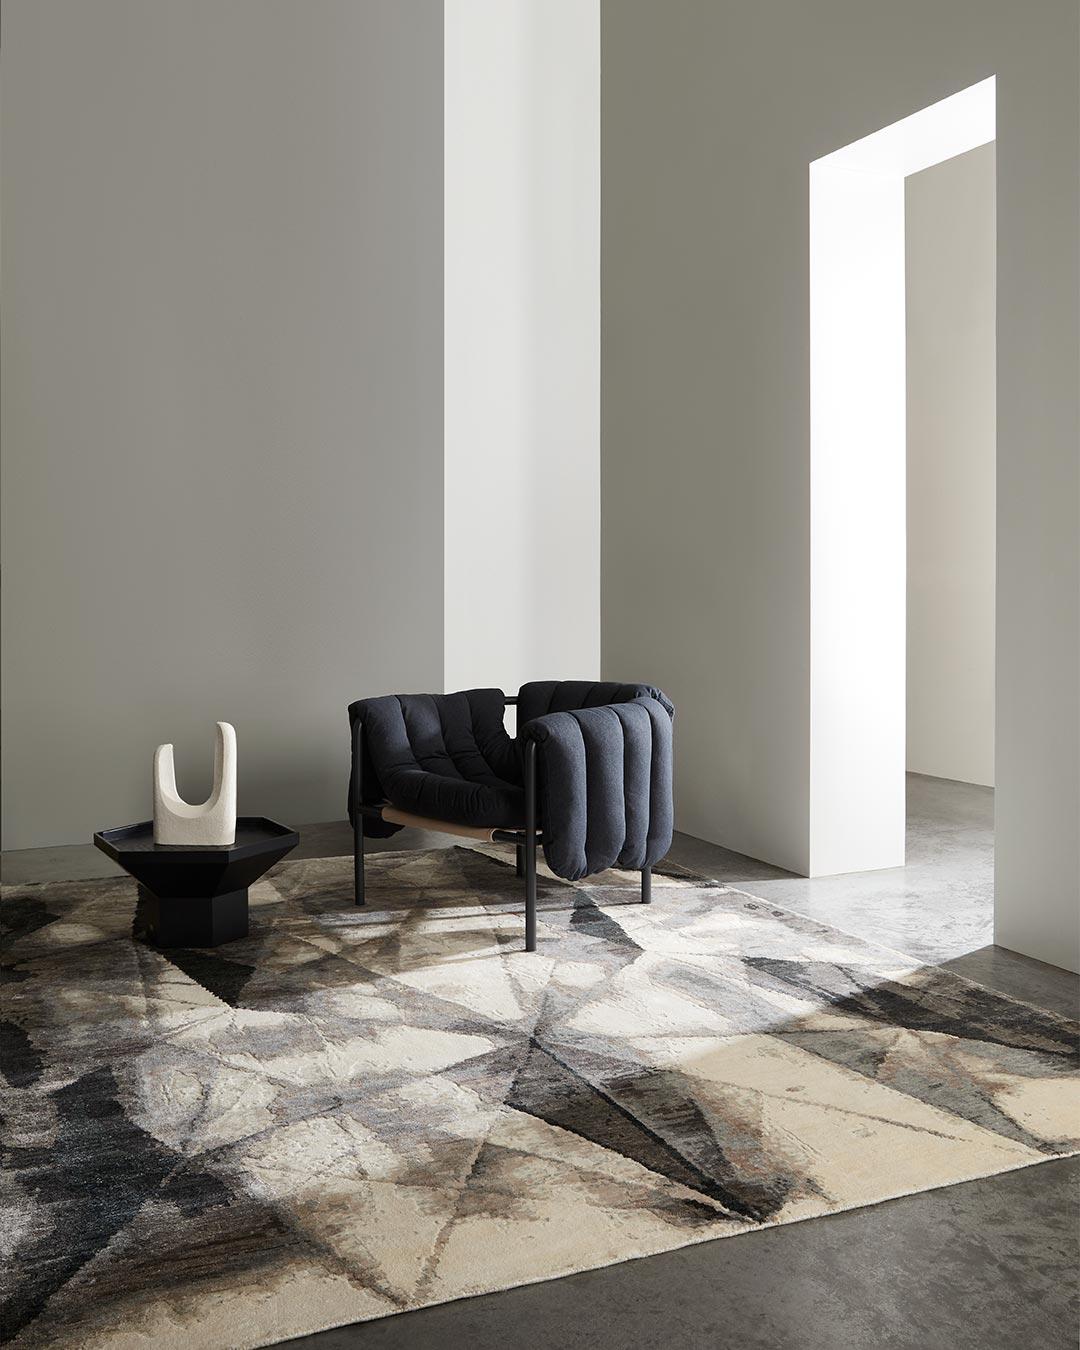 Living room image of geometric Atlas rug in grey colour